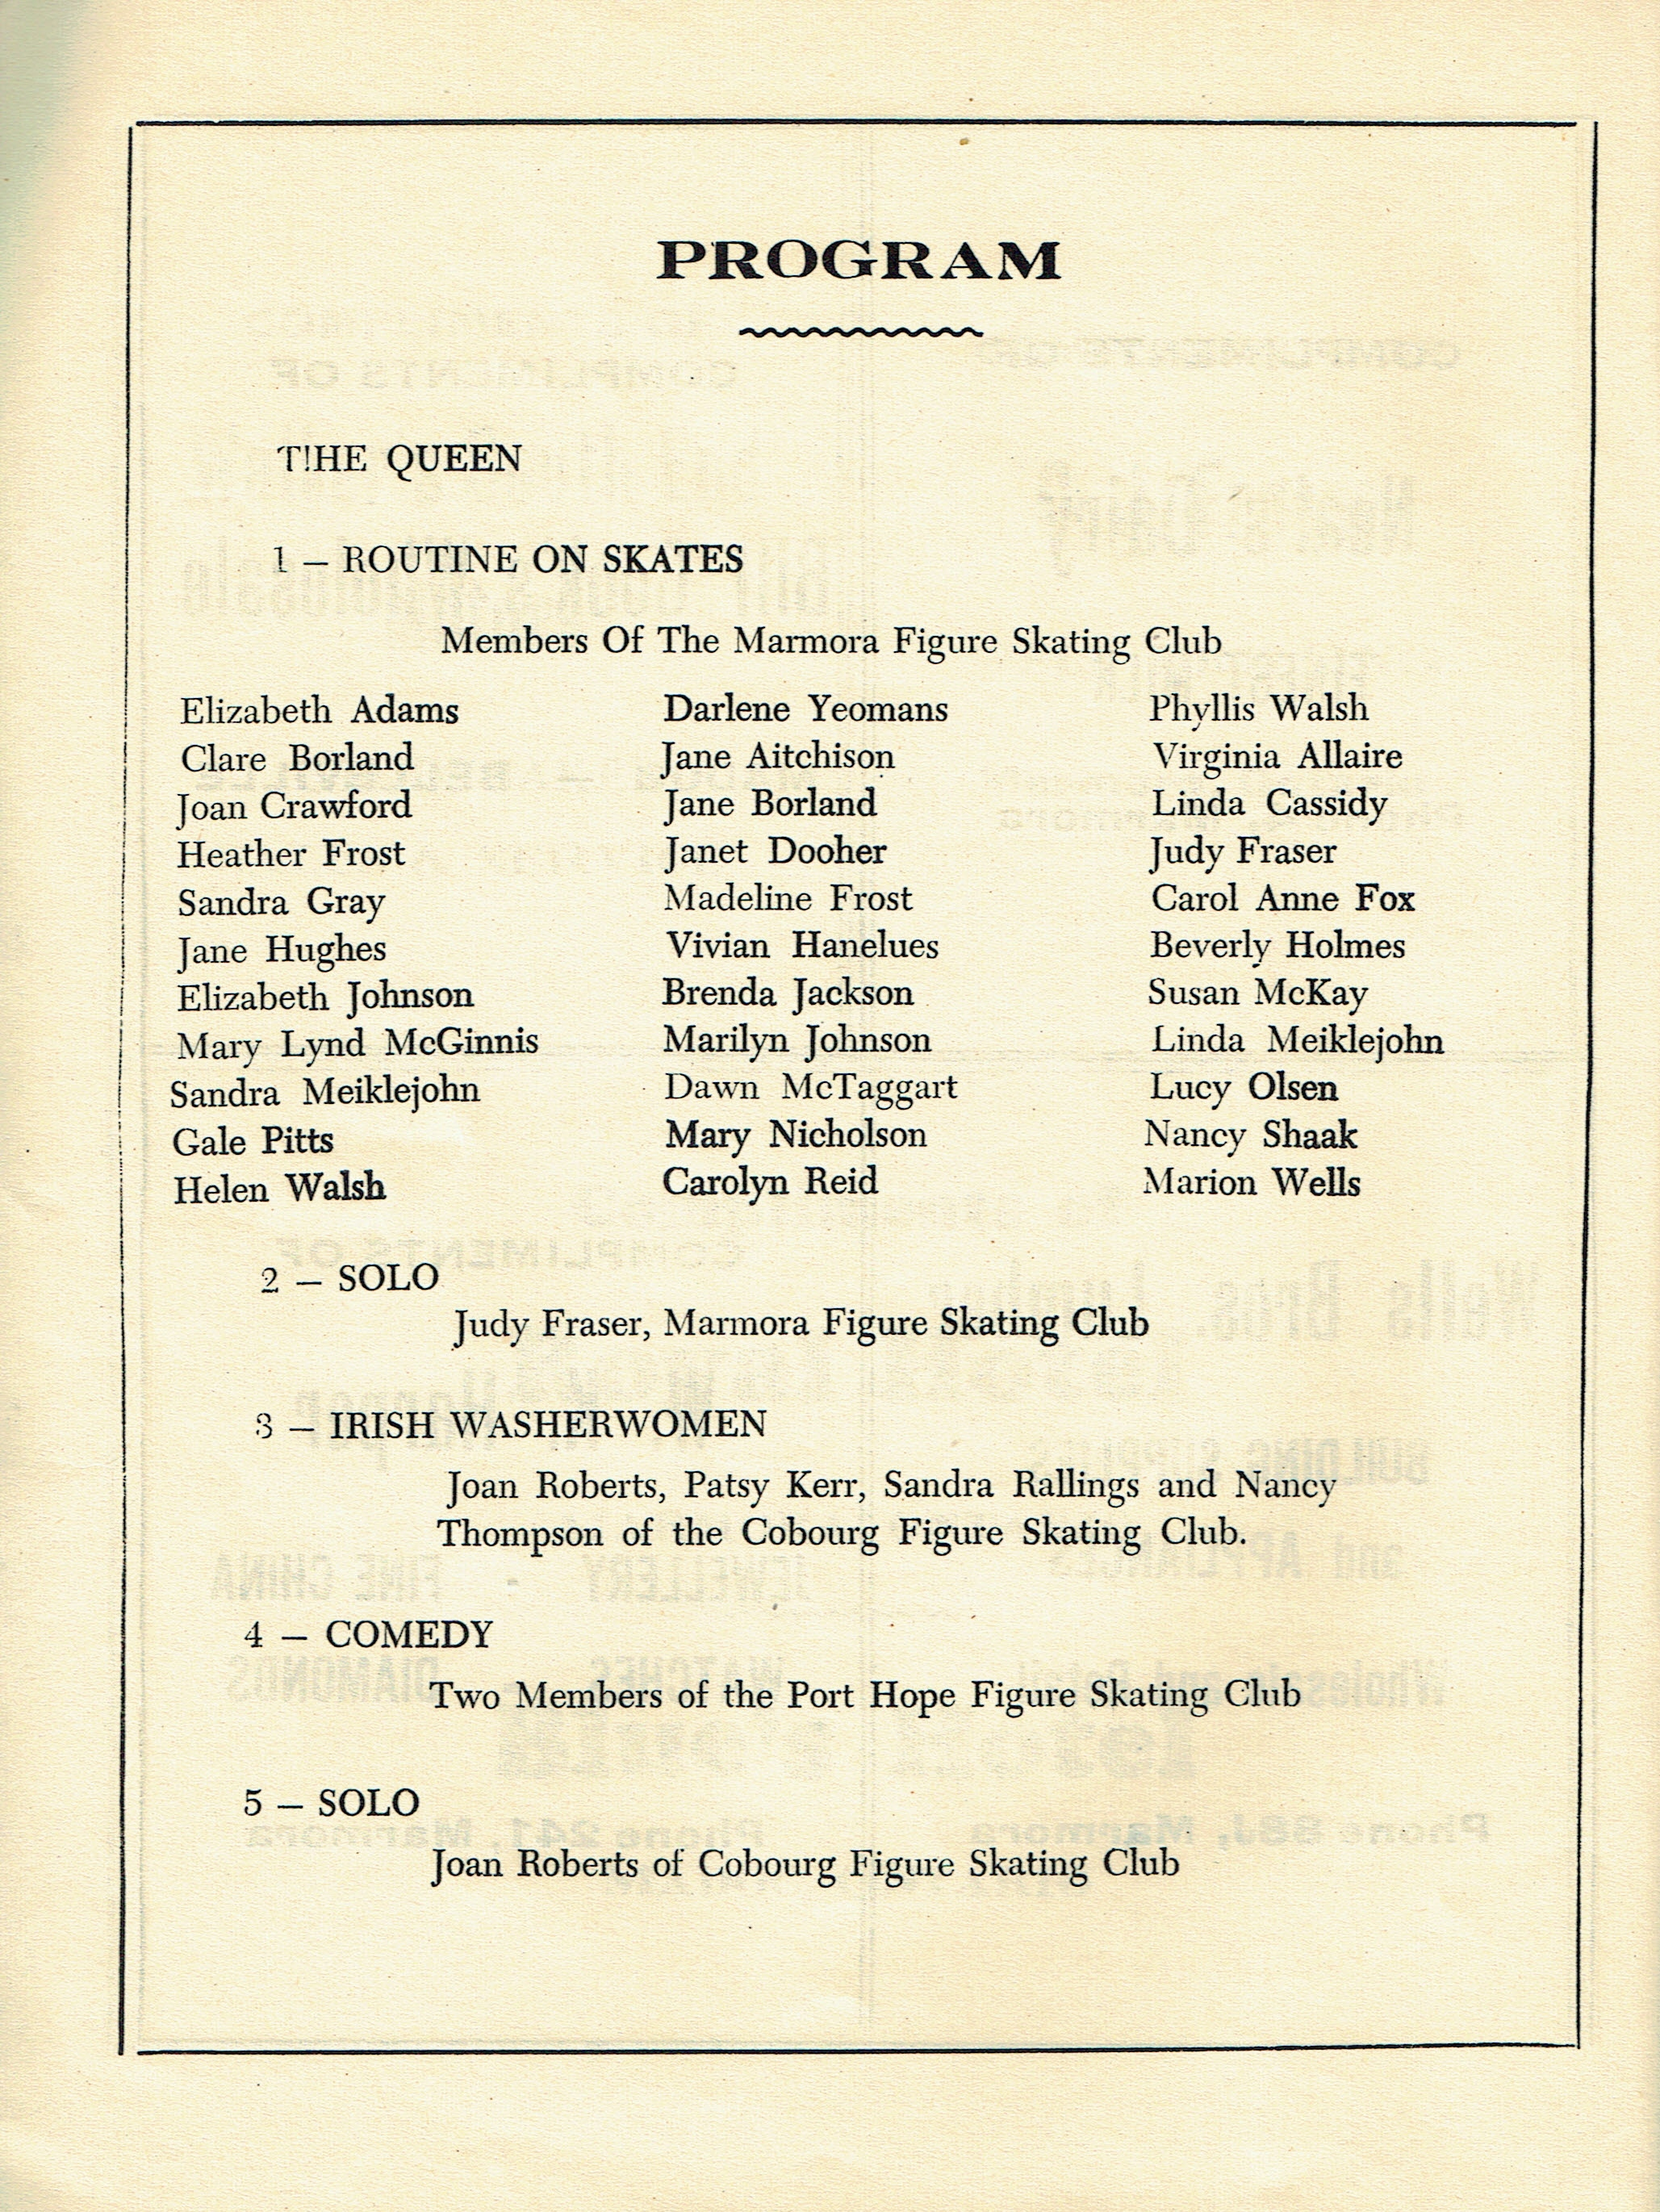 1955 Figure skating Club (3).jpg